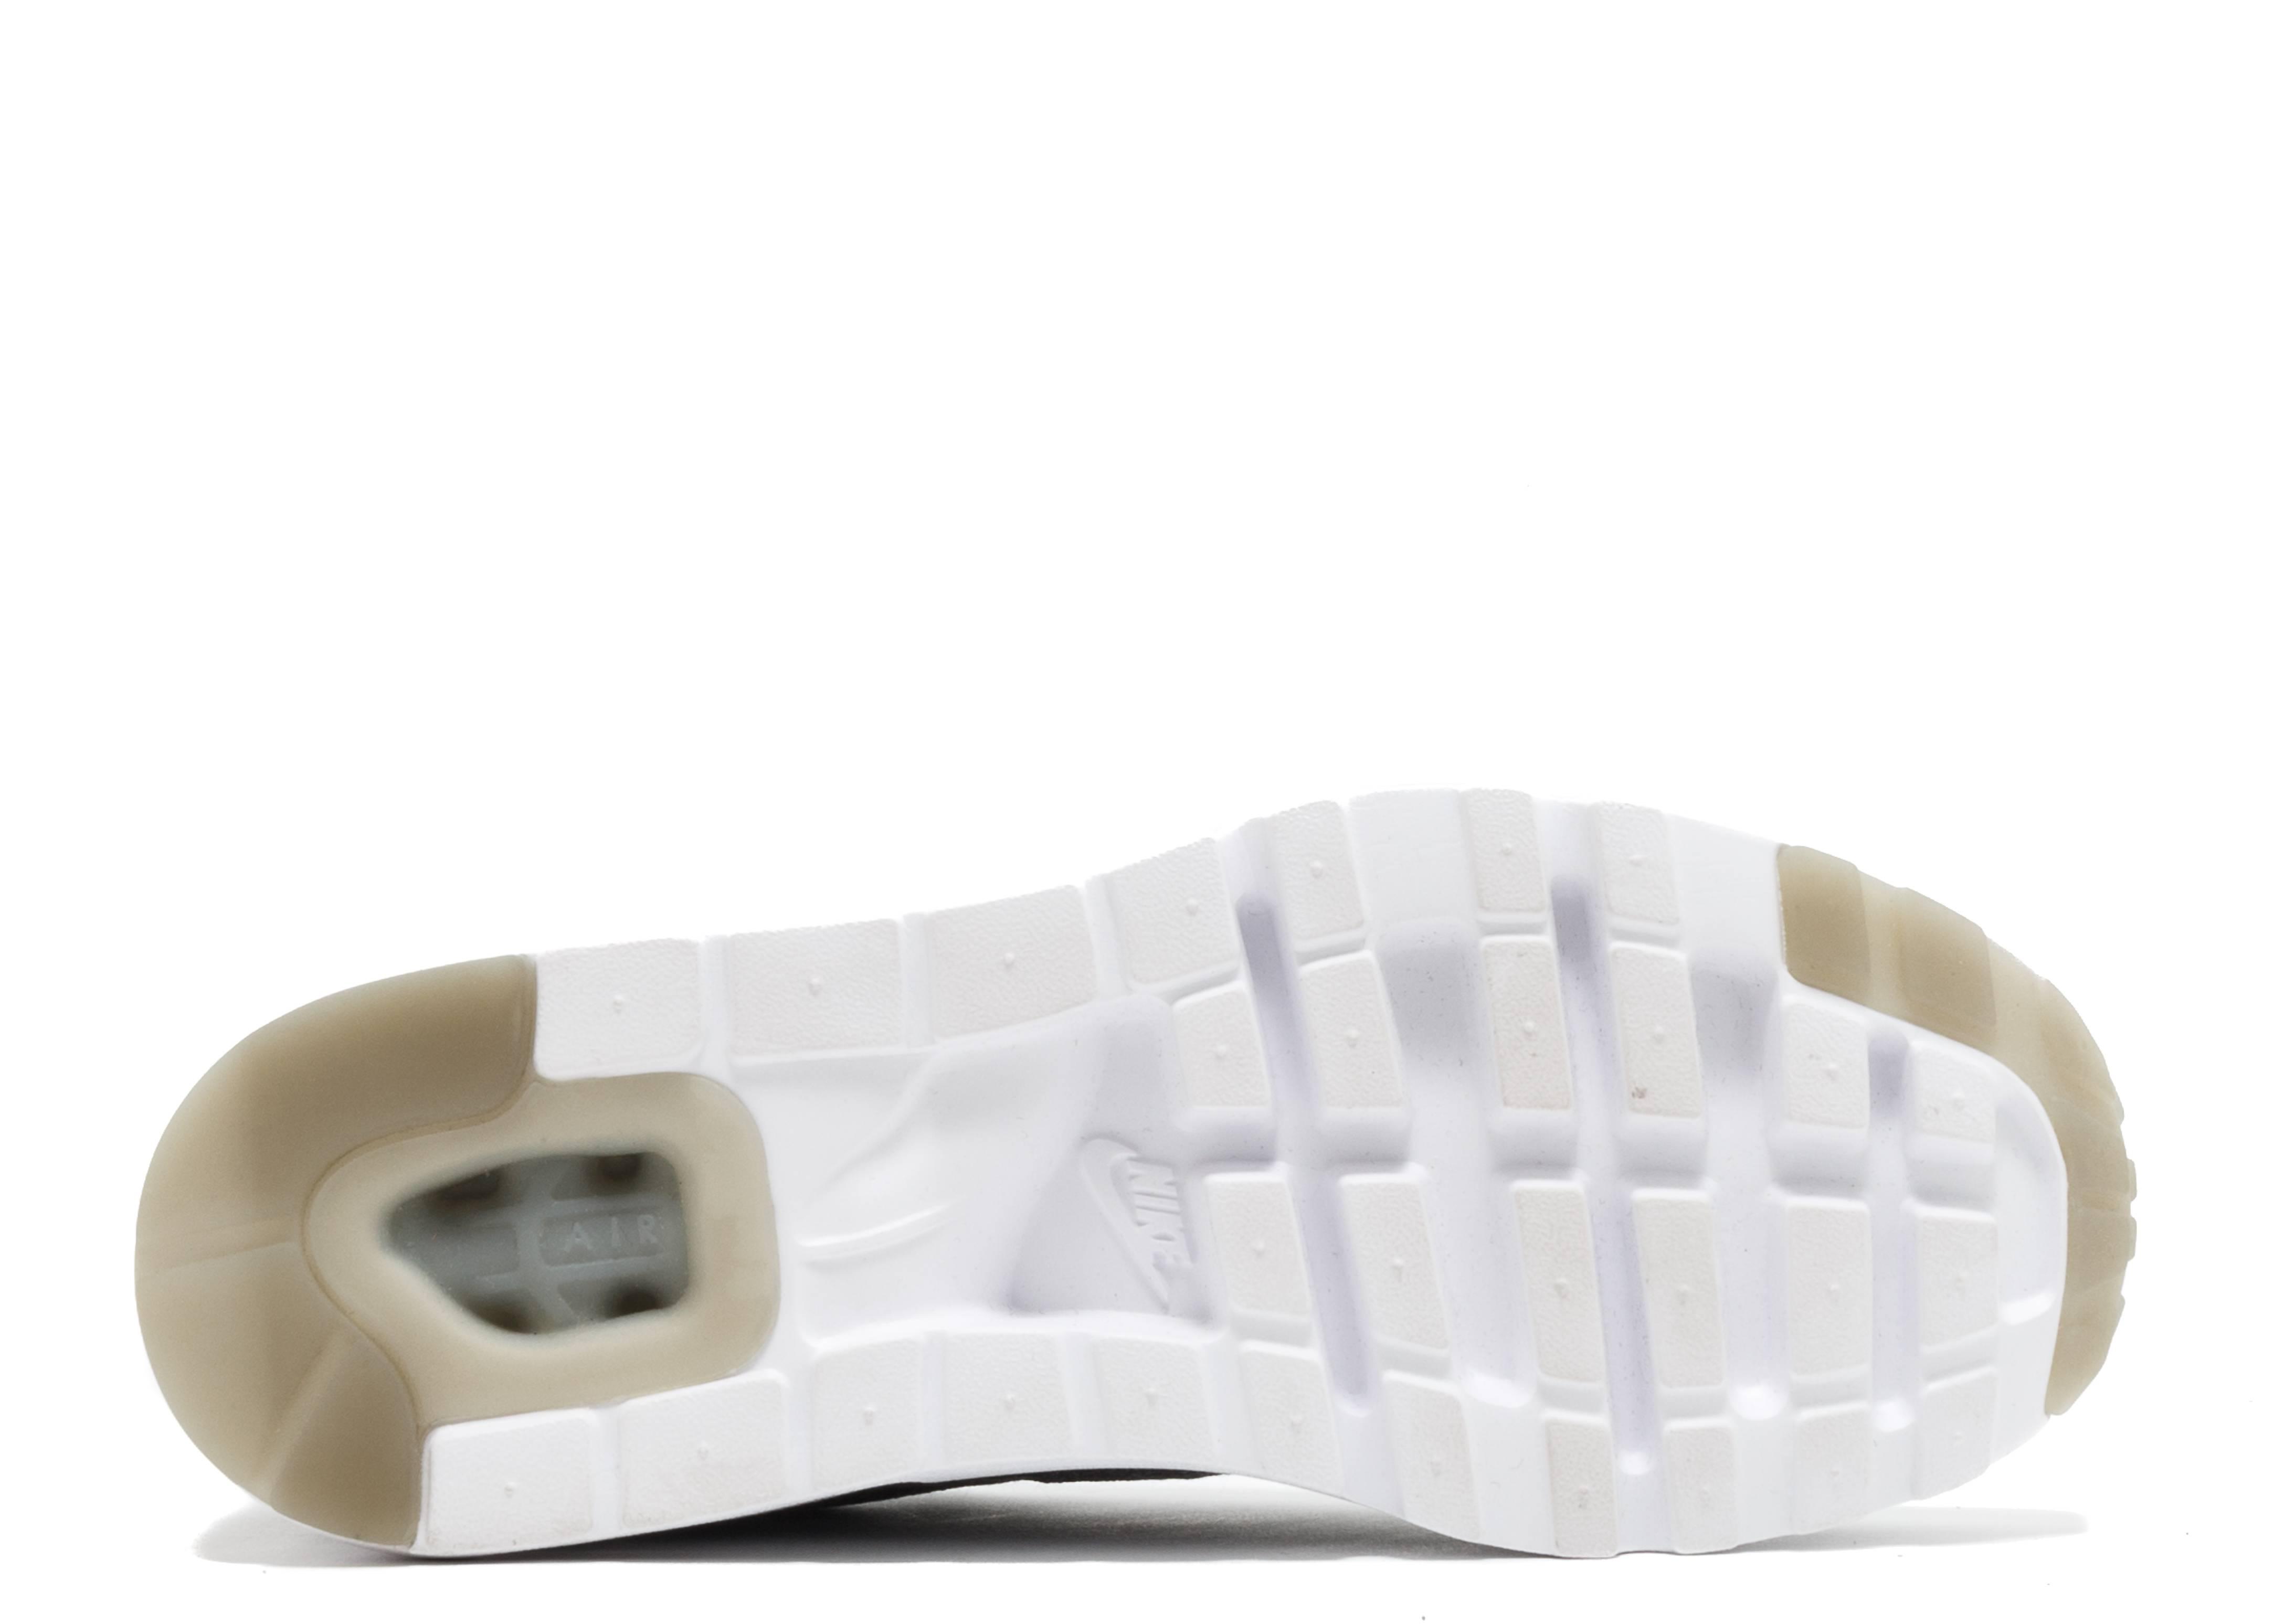 3be700f4fde Air Max 1 Ultra Flyknit - Nike - 843384 001 - wolf grey wlf grey-drk  gry-wht